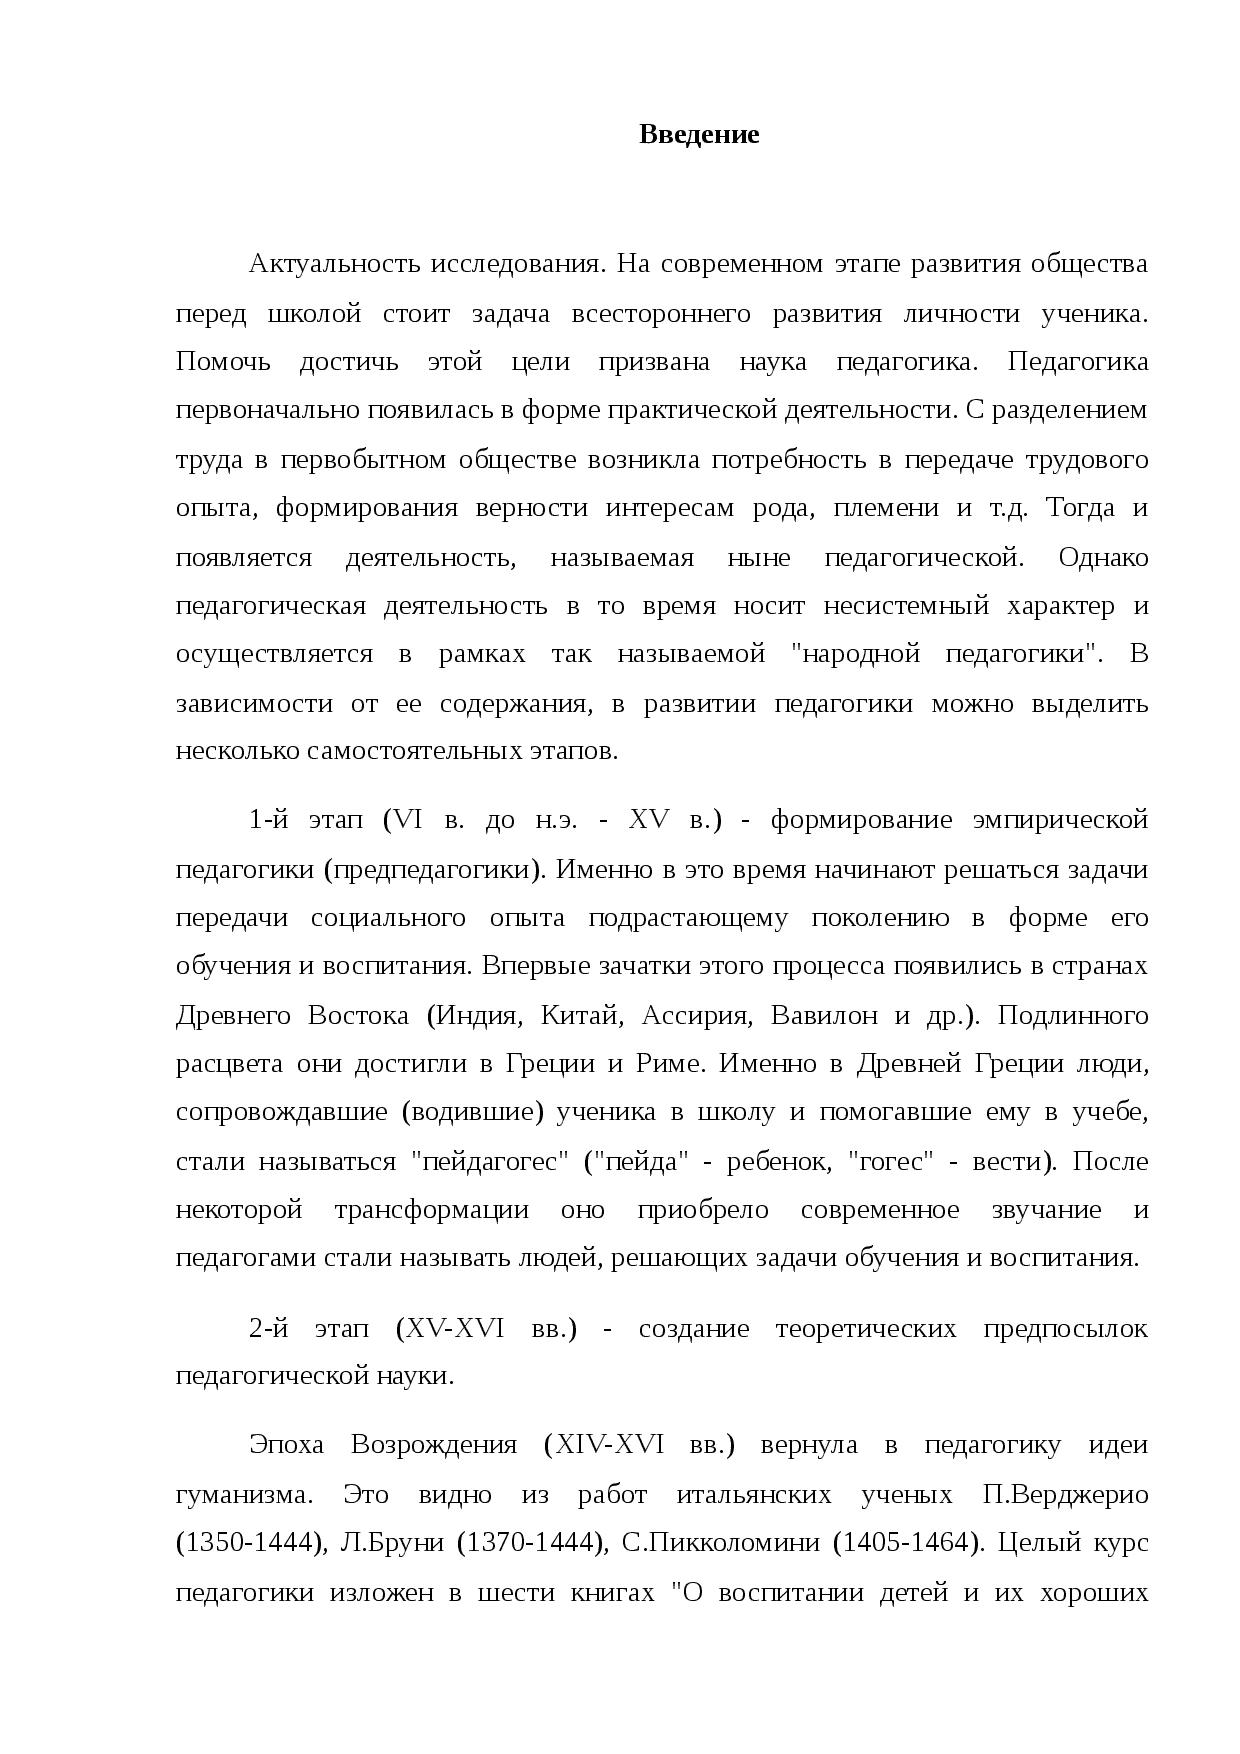 Предмет и задачи тифлопедагогики